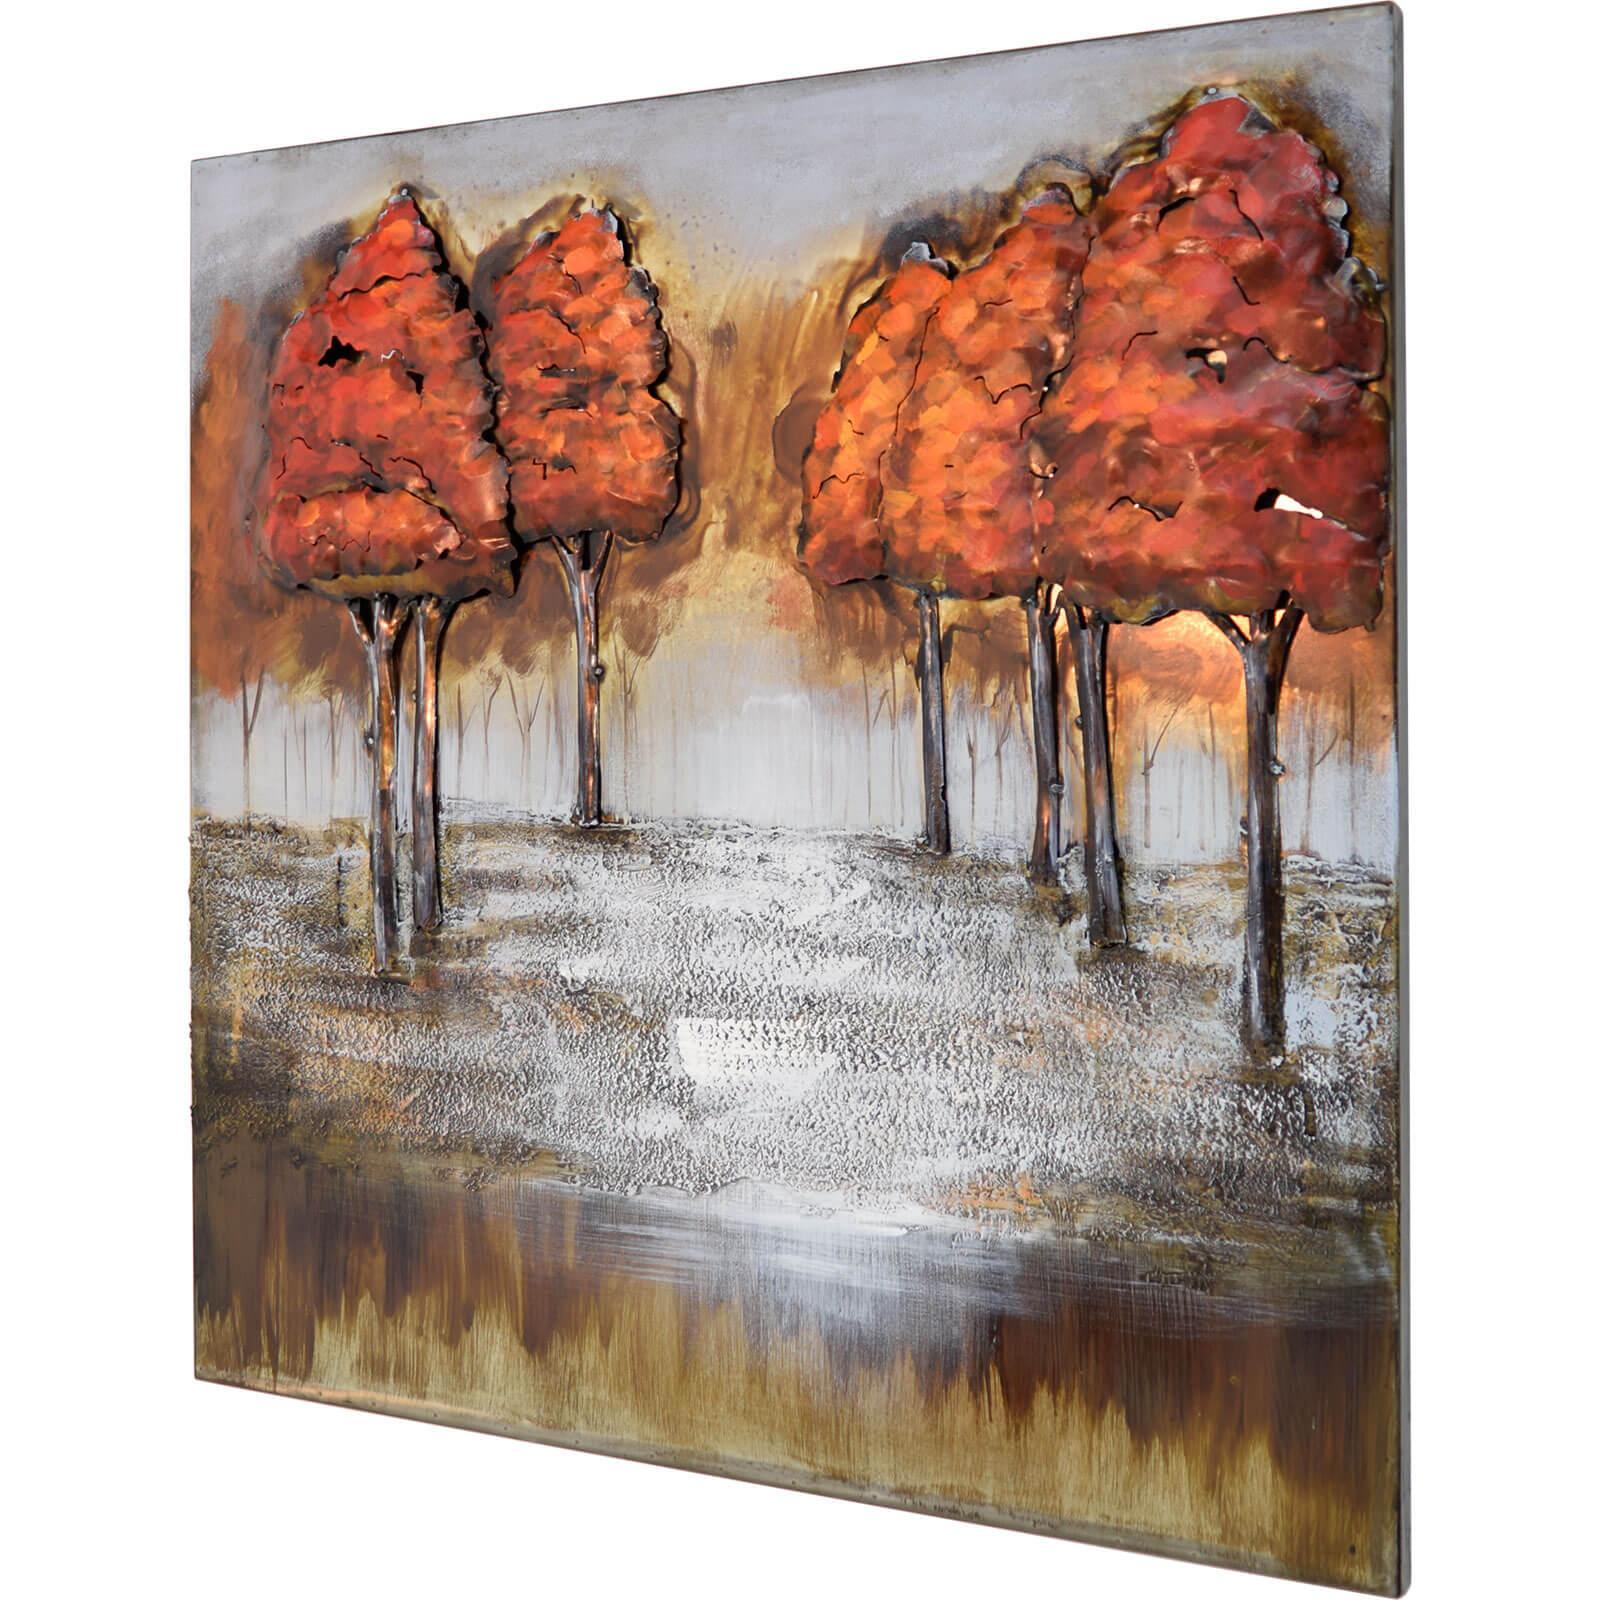 3D Metallbild Wald Wandbild 80 x 80 cm